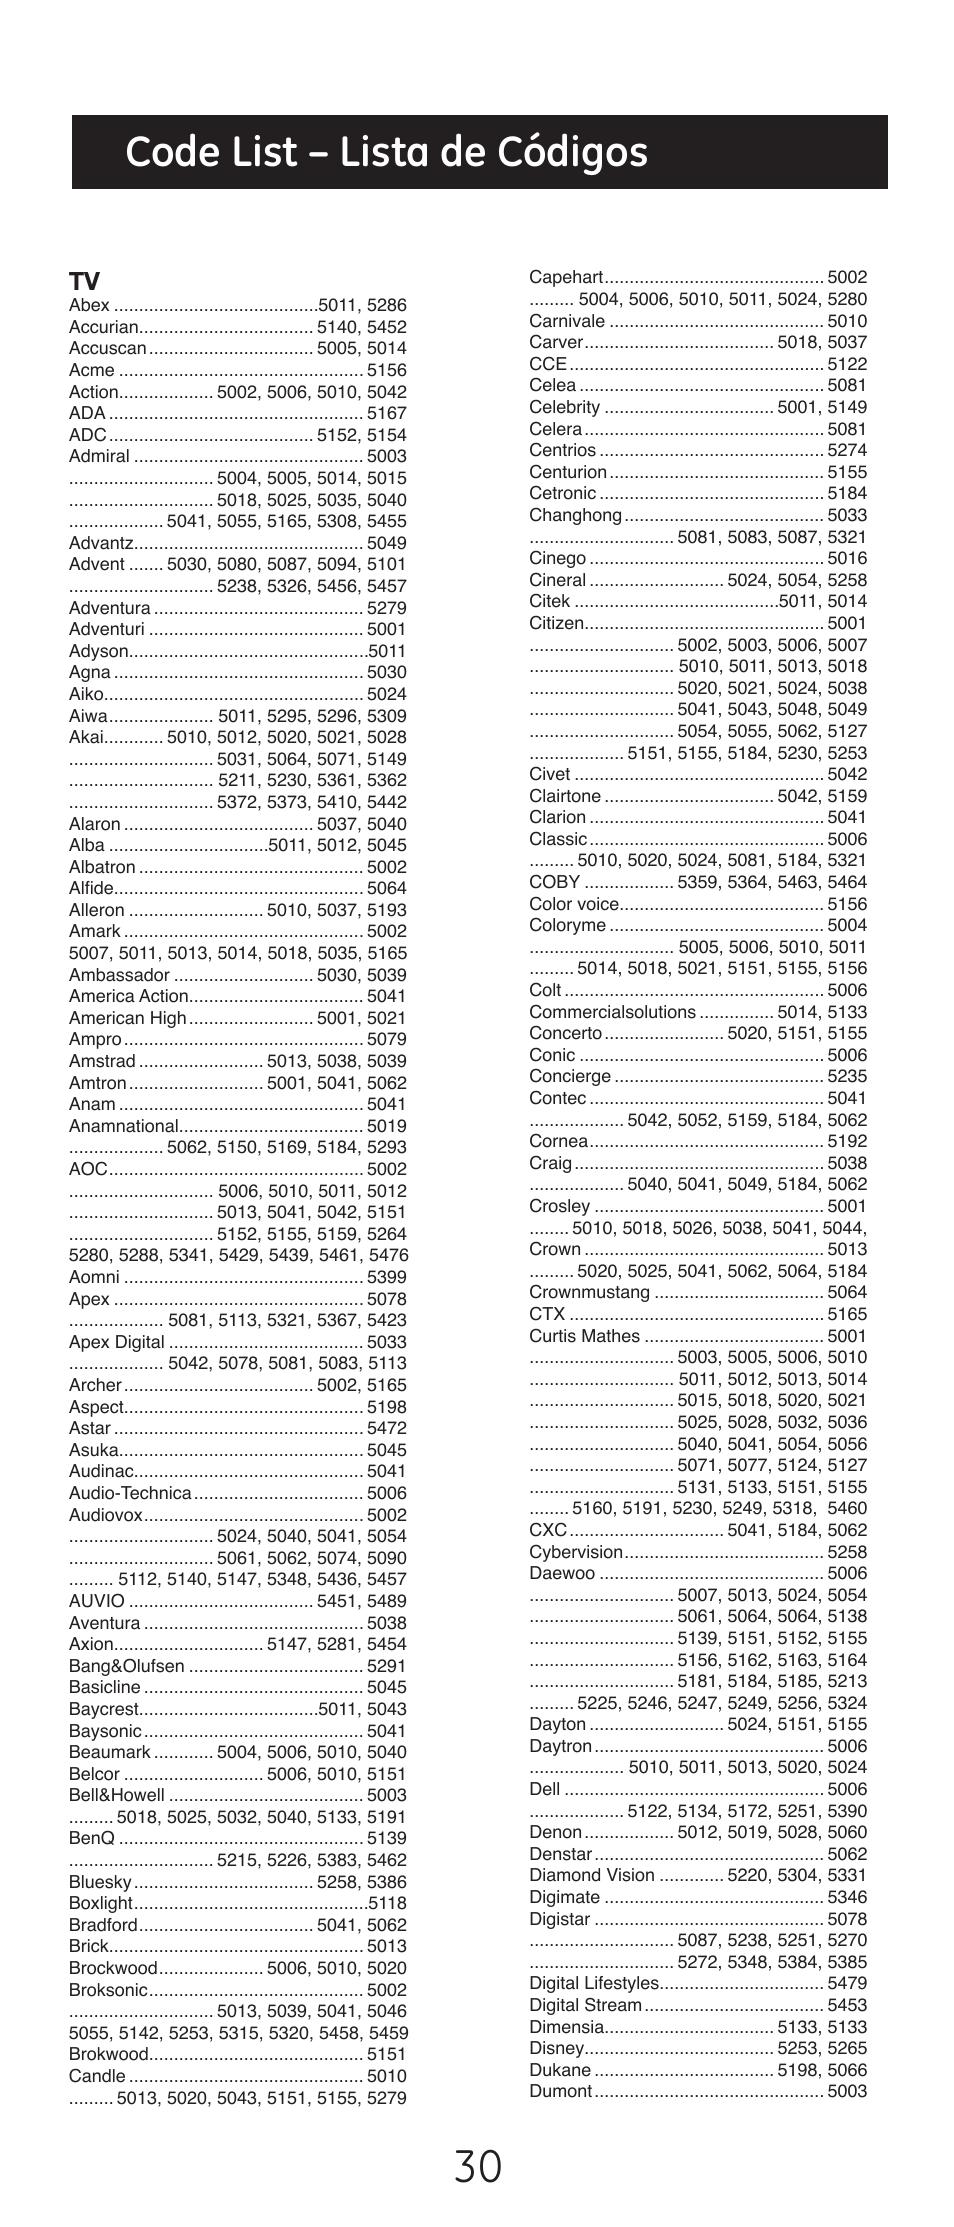 Code list